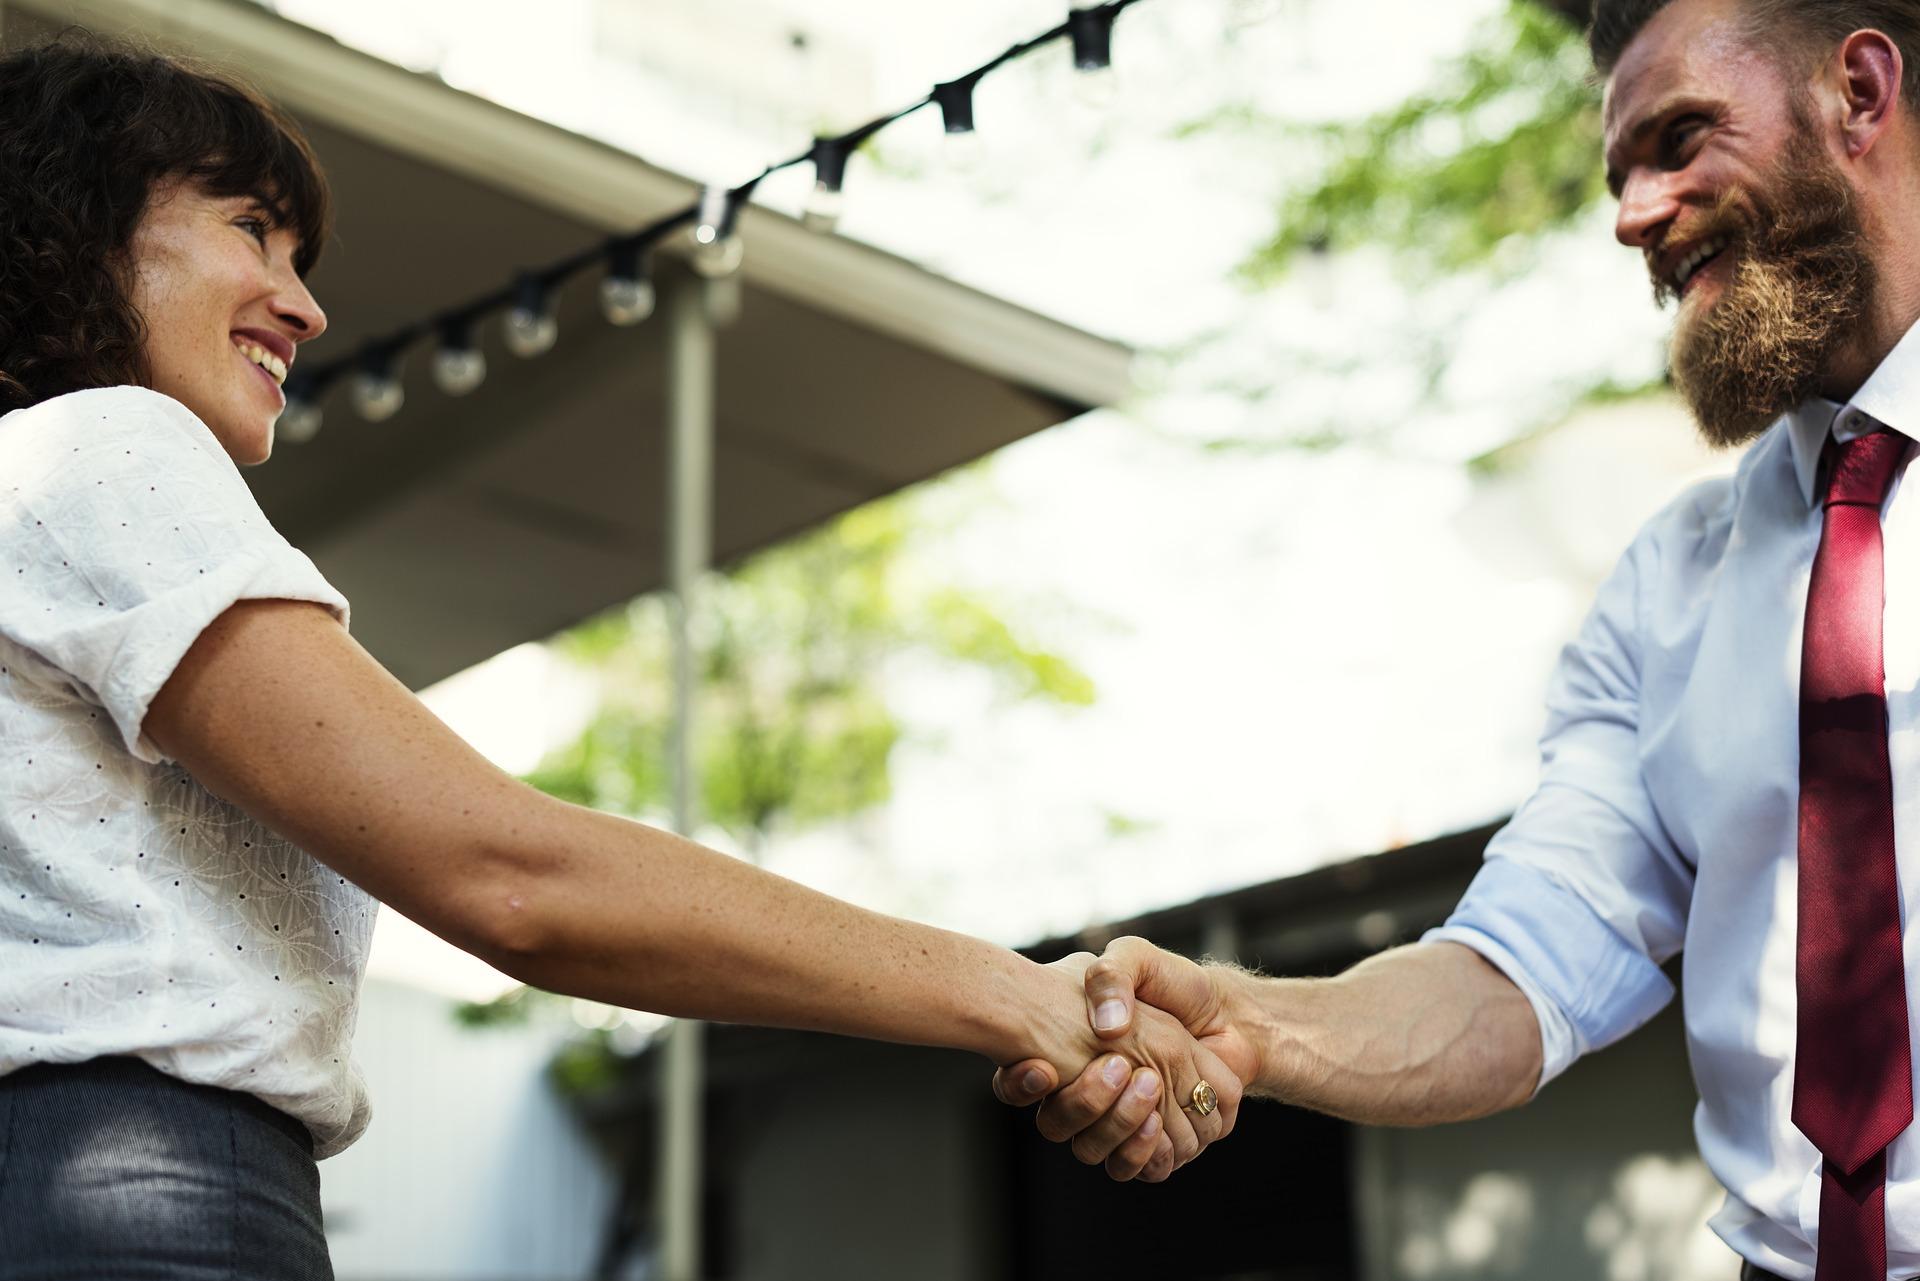 Handshake merchant services